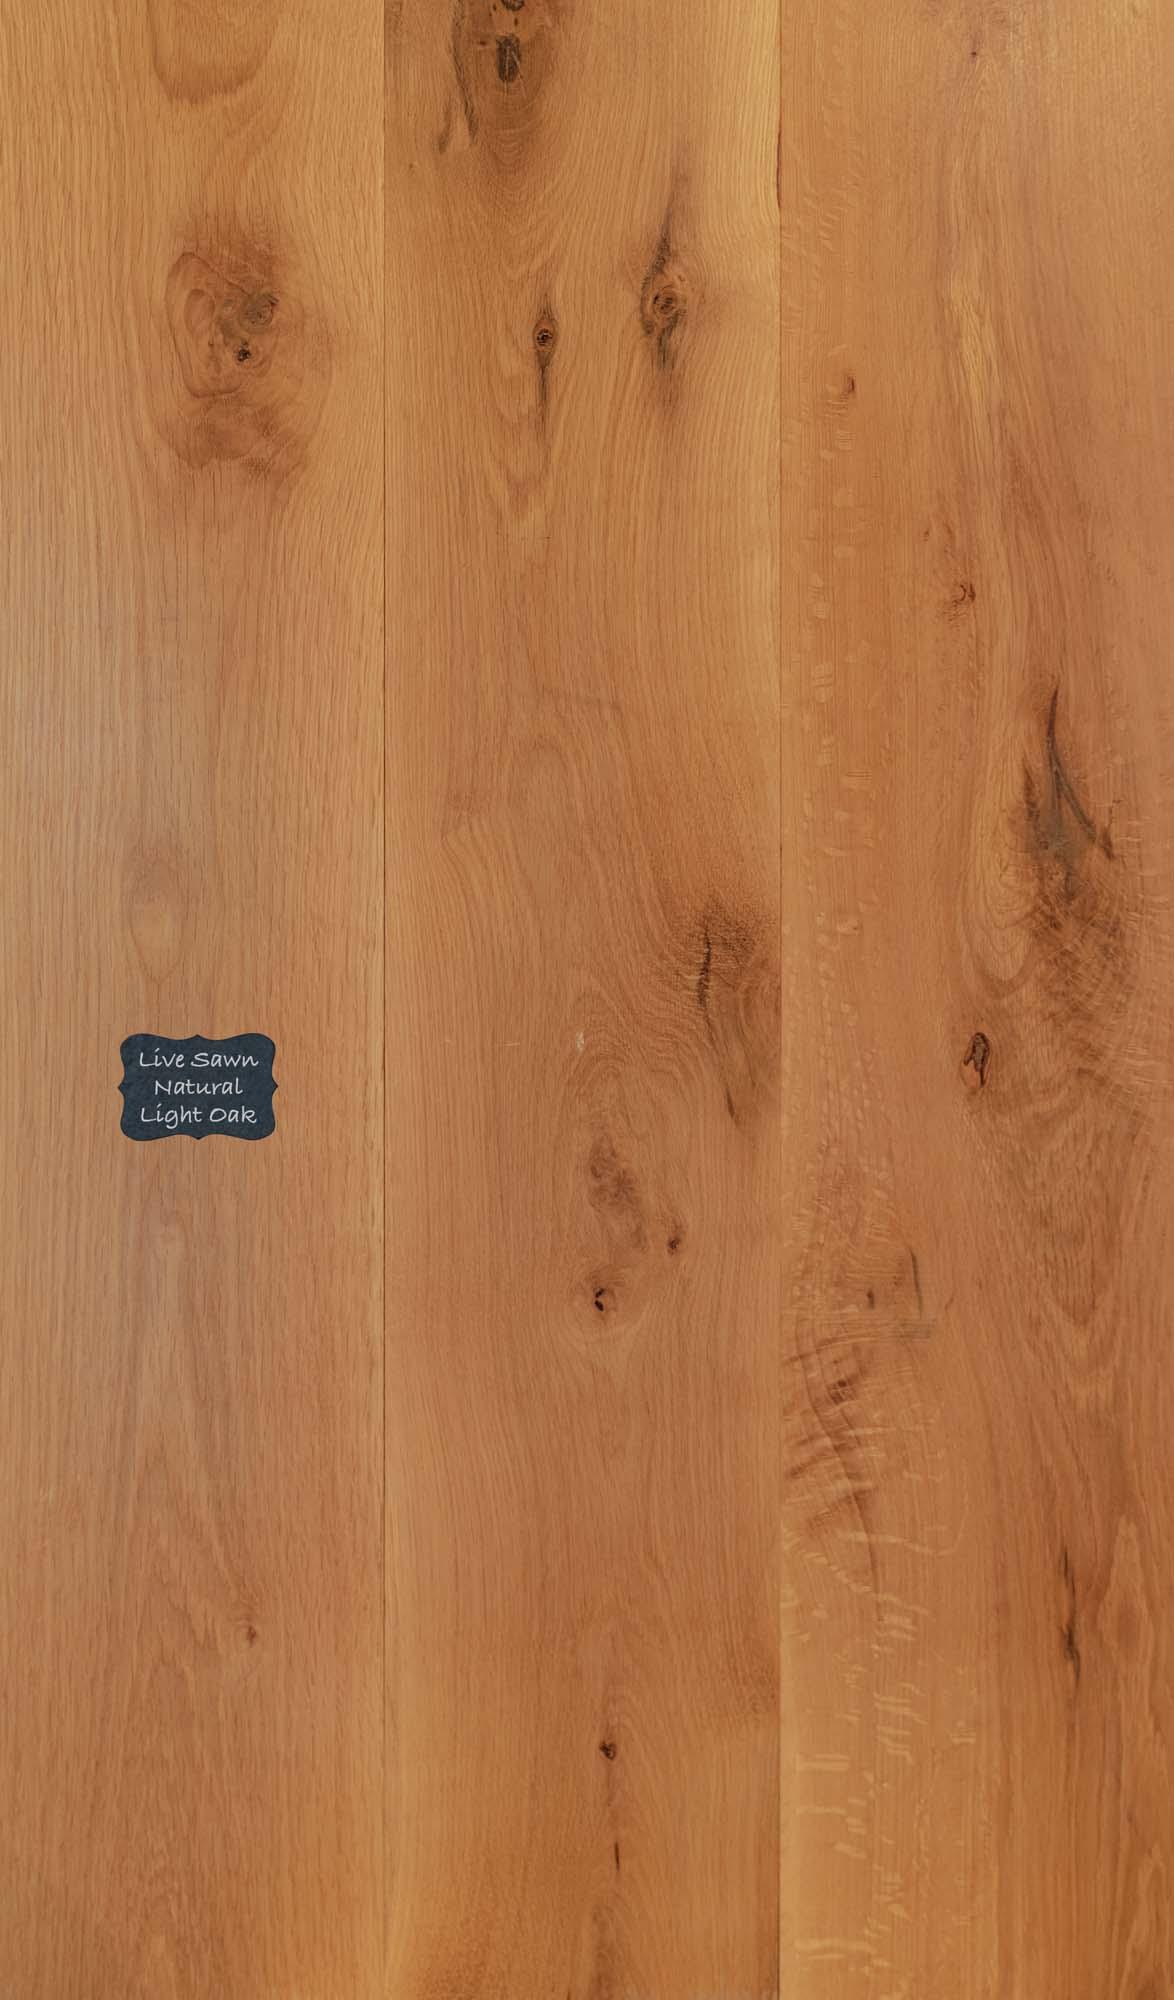 Live Sawn Natural Light oak Wood Flooring